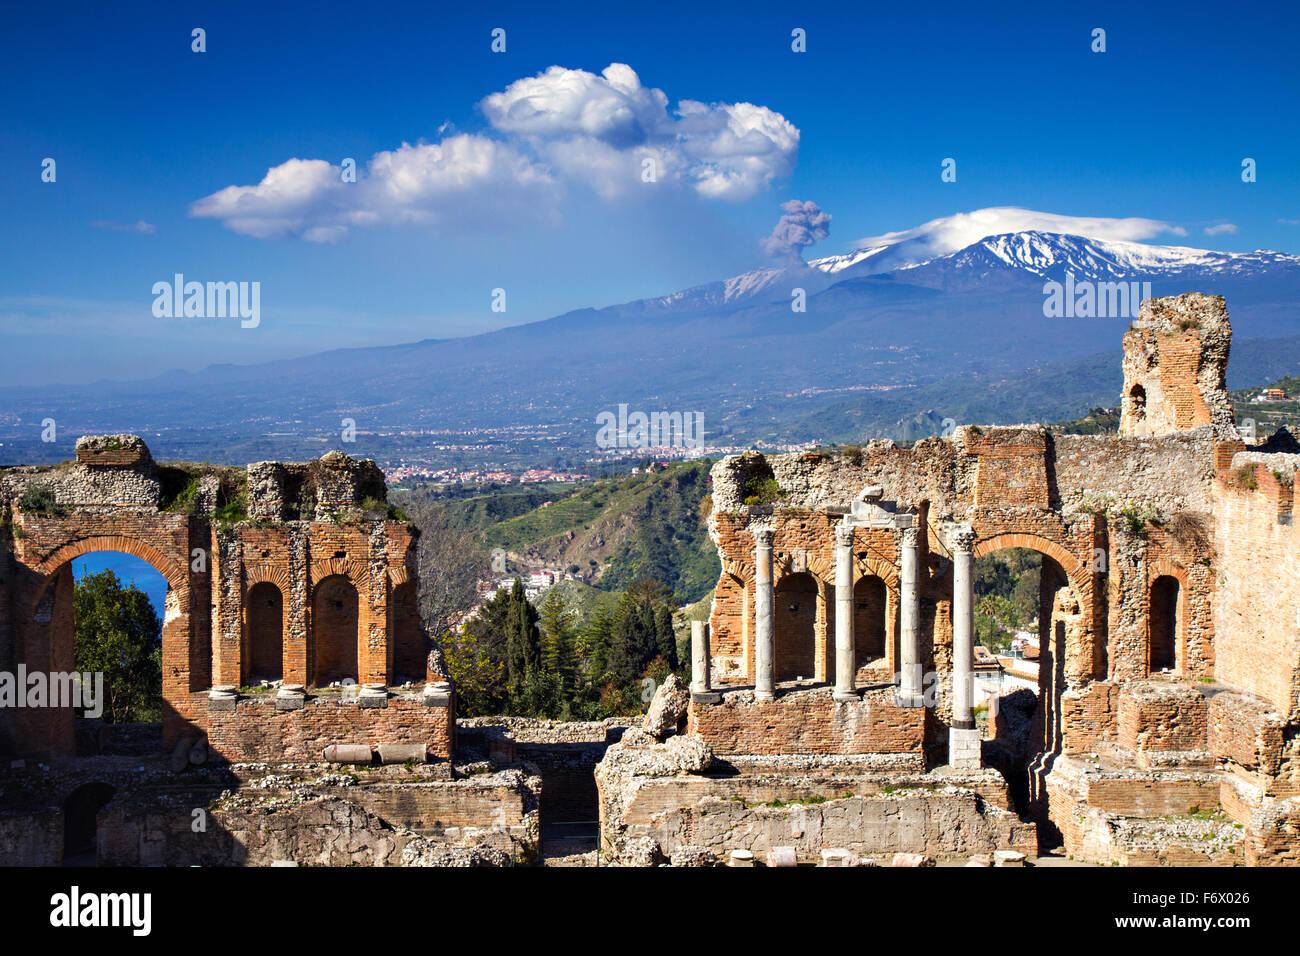 Ruines du théâtre romain grec avec l'éruption de l'Etna, Taormina, Sicile, Italie Photo Stock